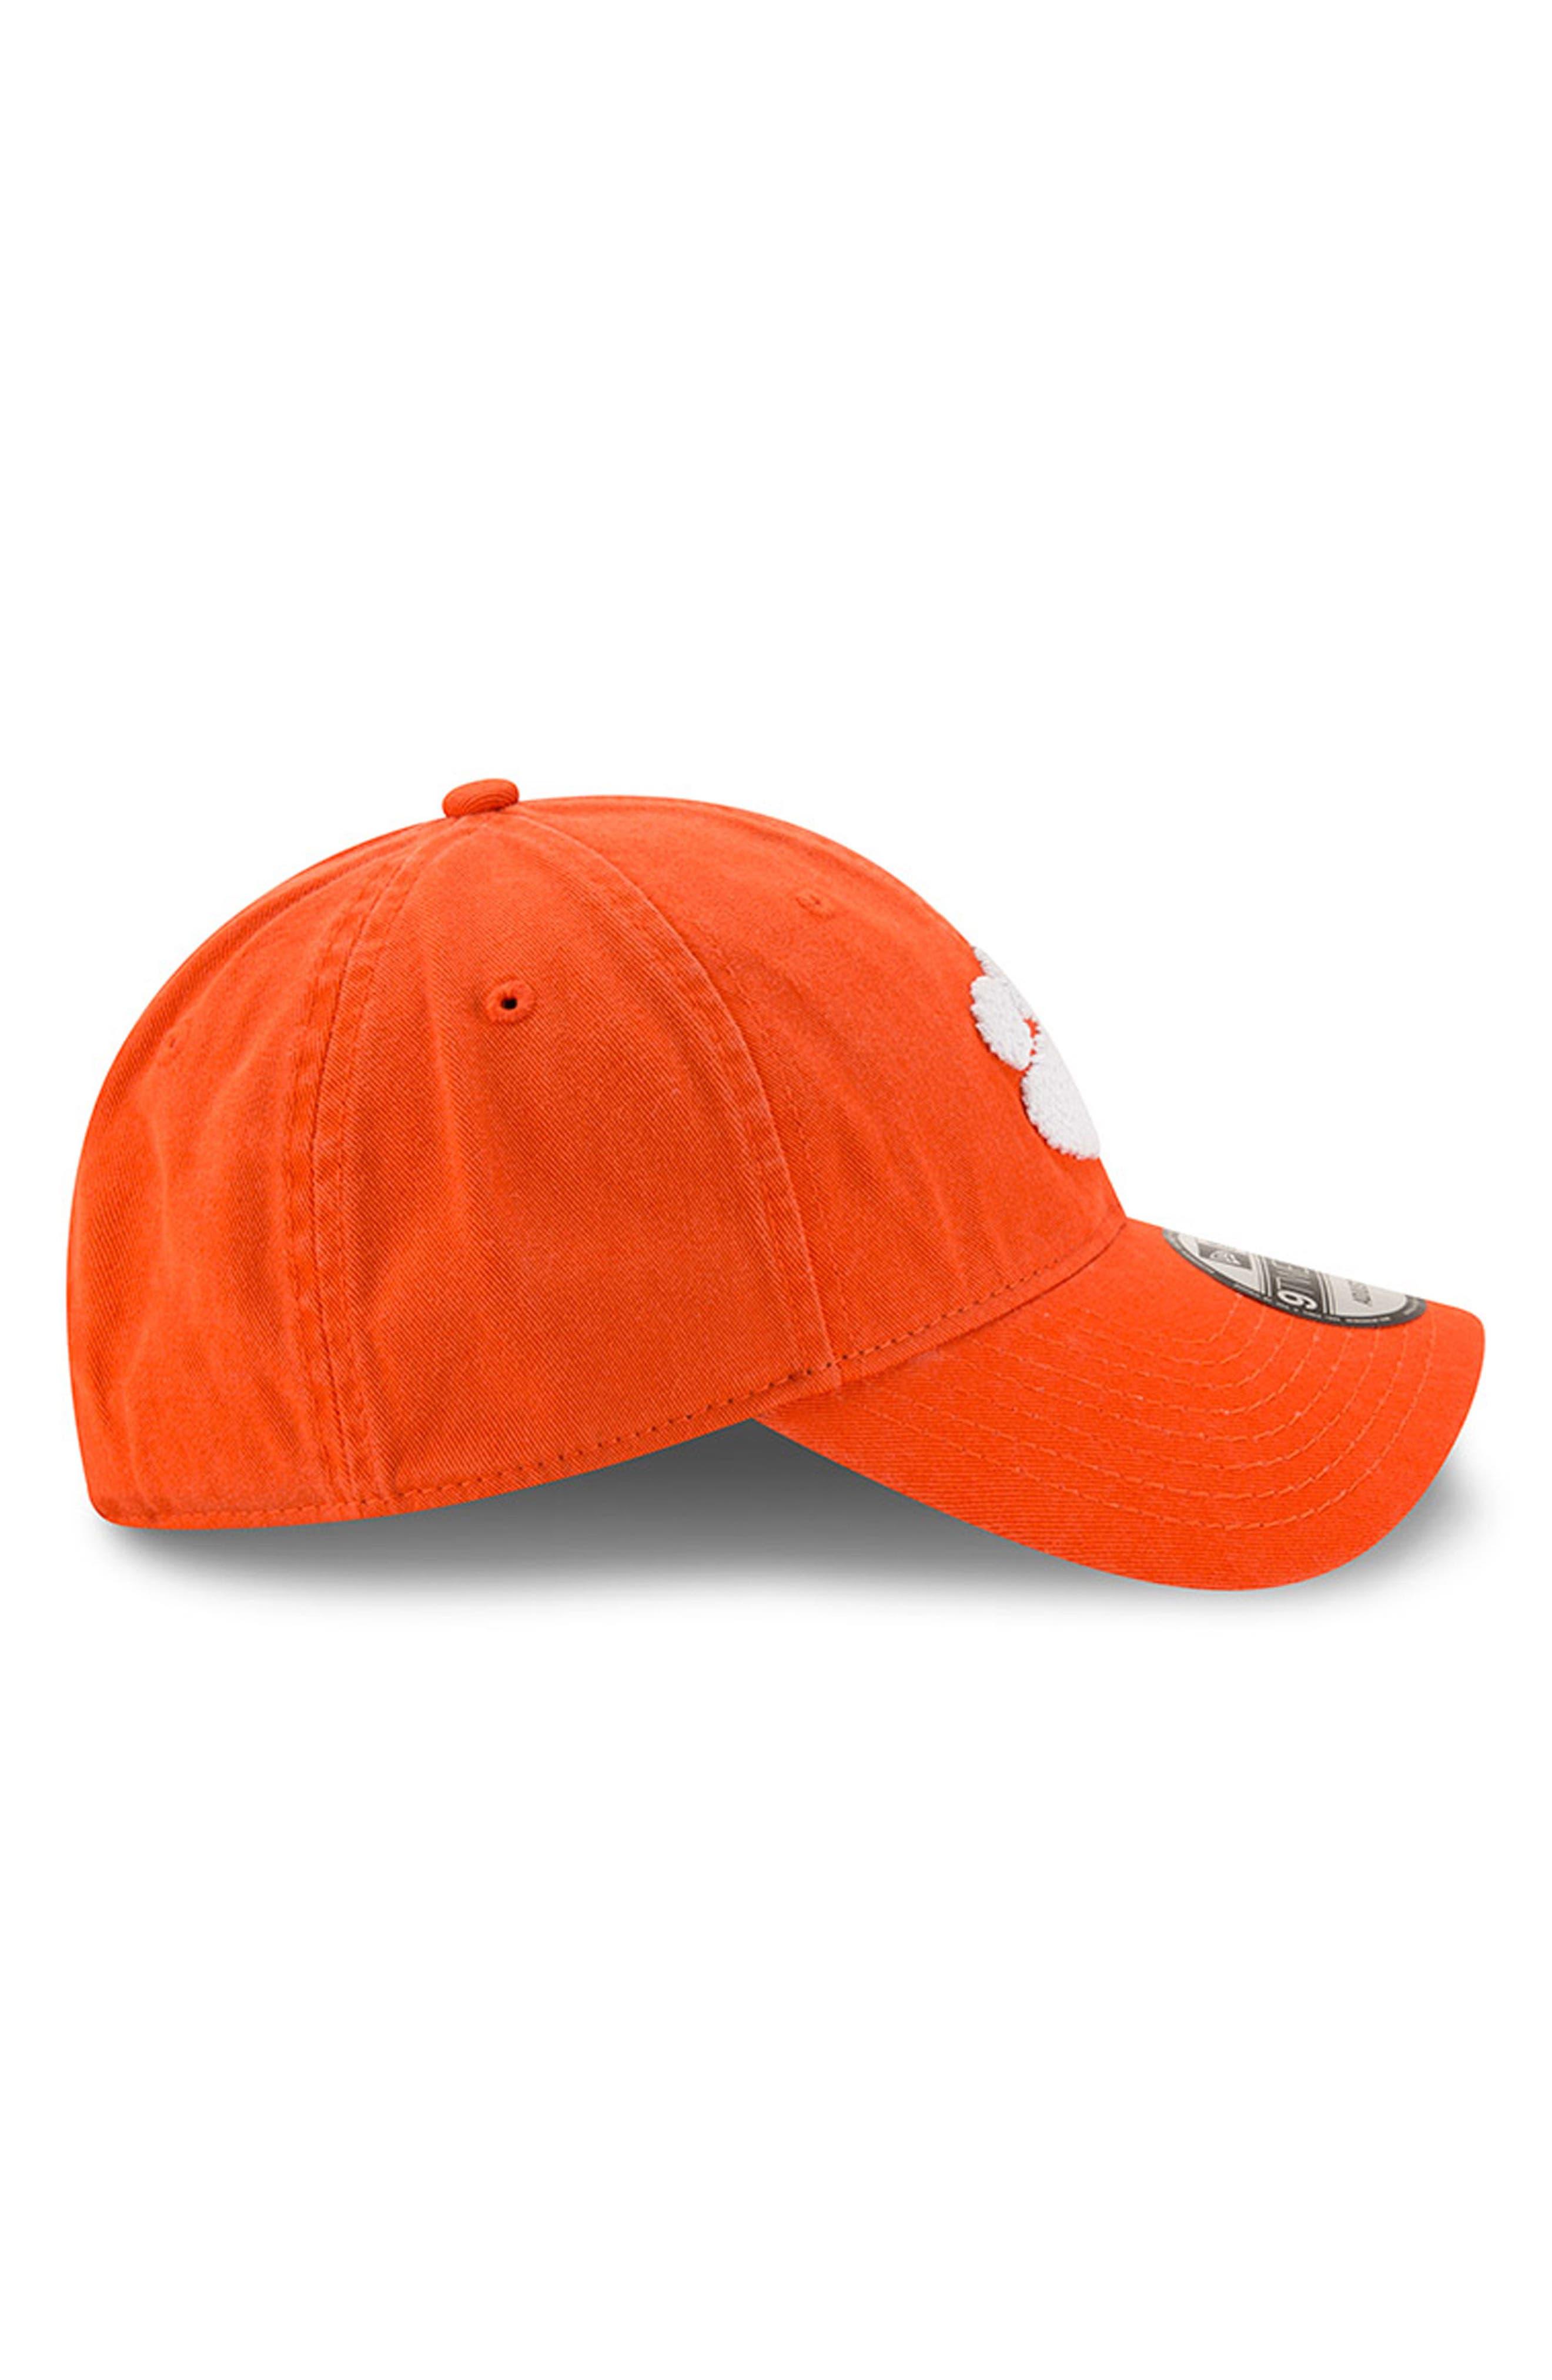 New Era Collegiate Core Classic - Clemson Tigers Baseball Cap,                             Alternate thumbnail 4, color,